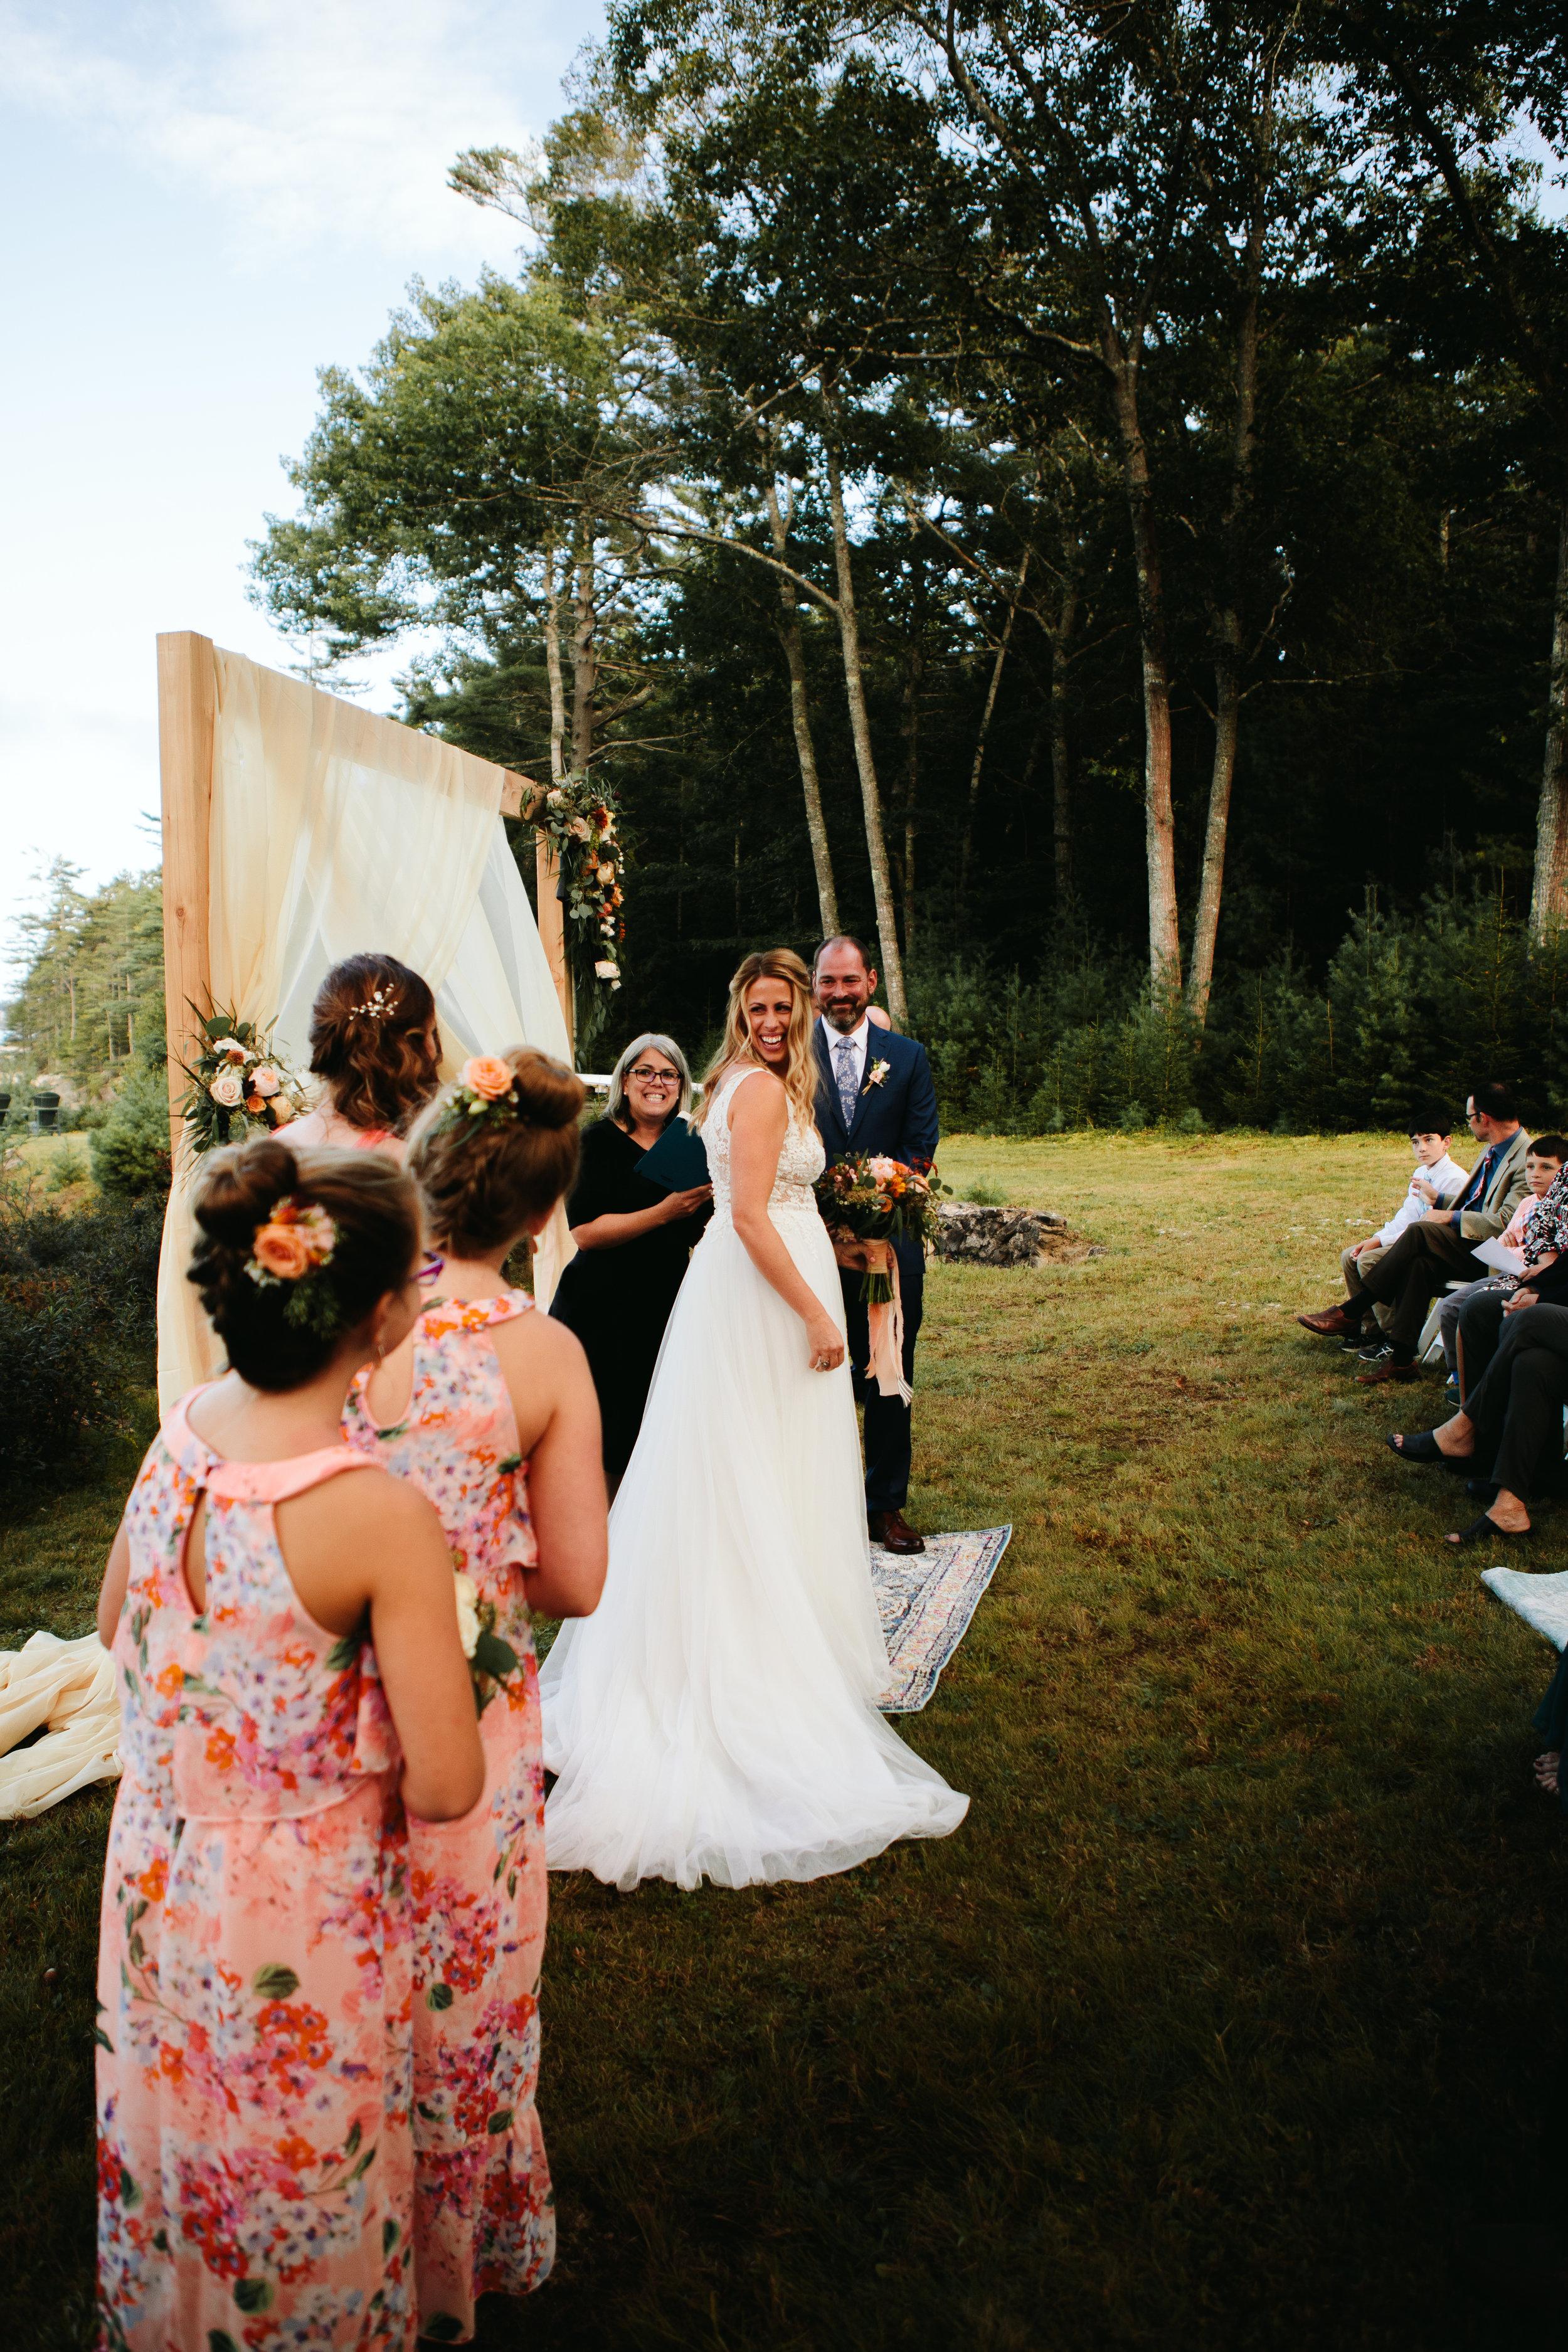 georgetown-maine-wedding-ceremony-9.jpg